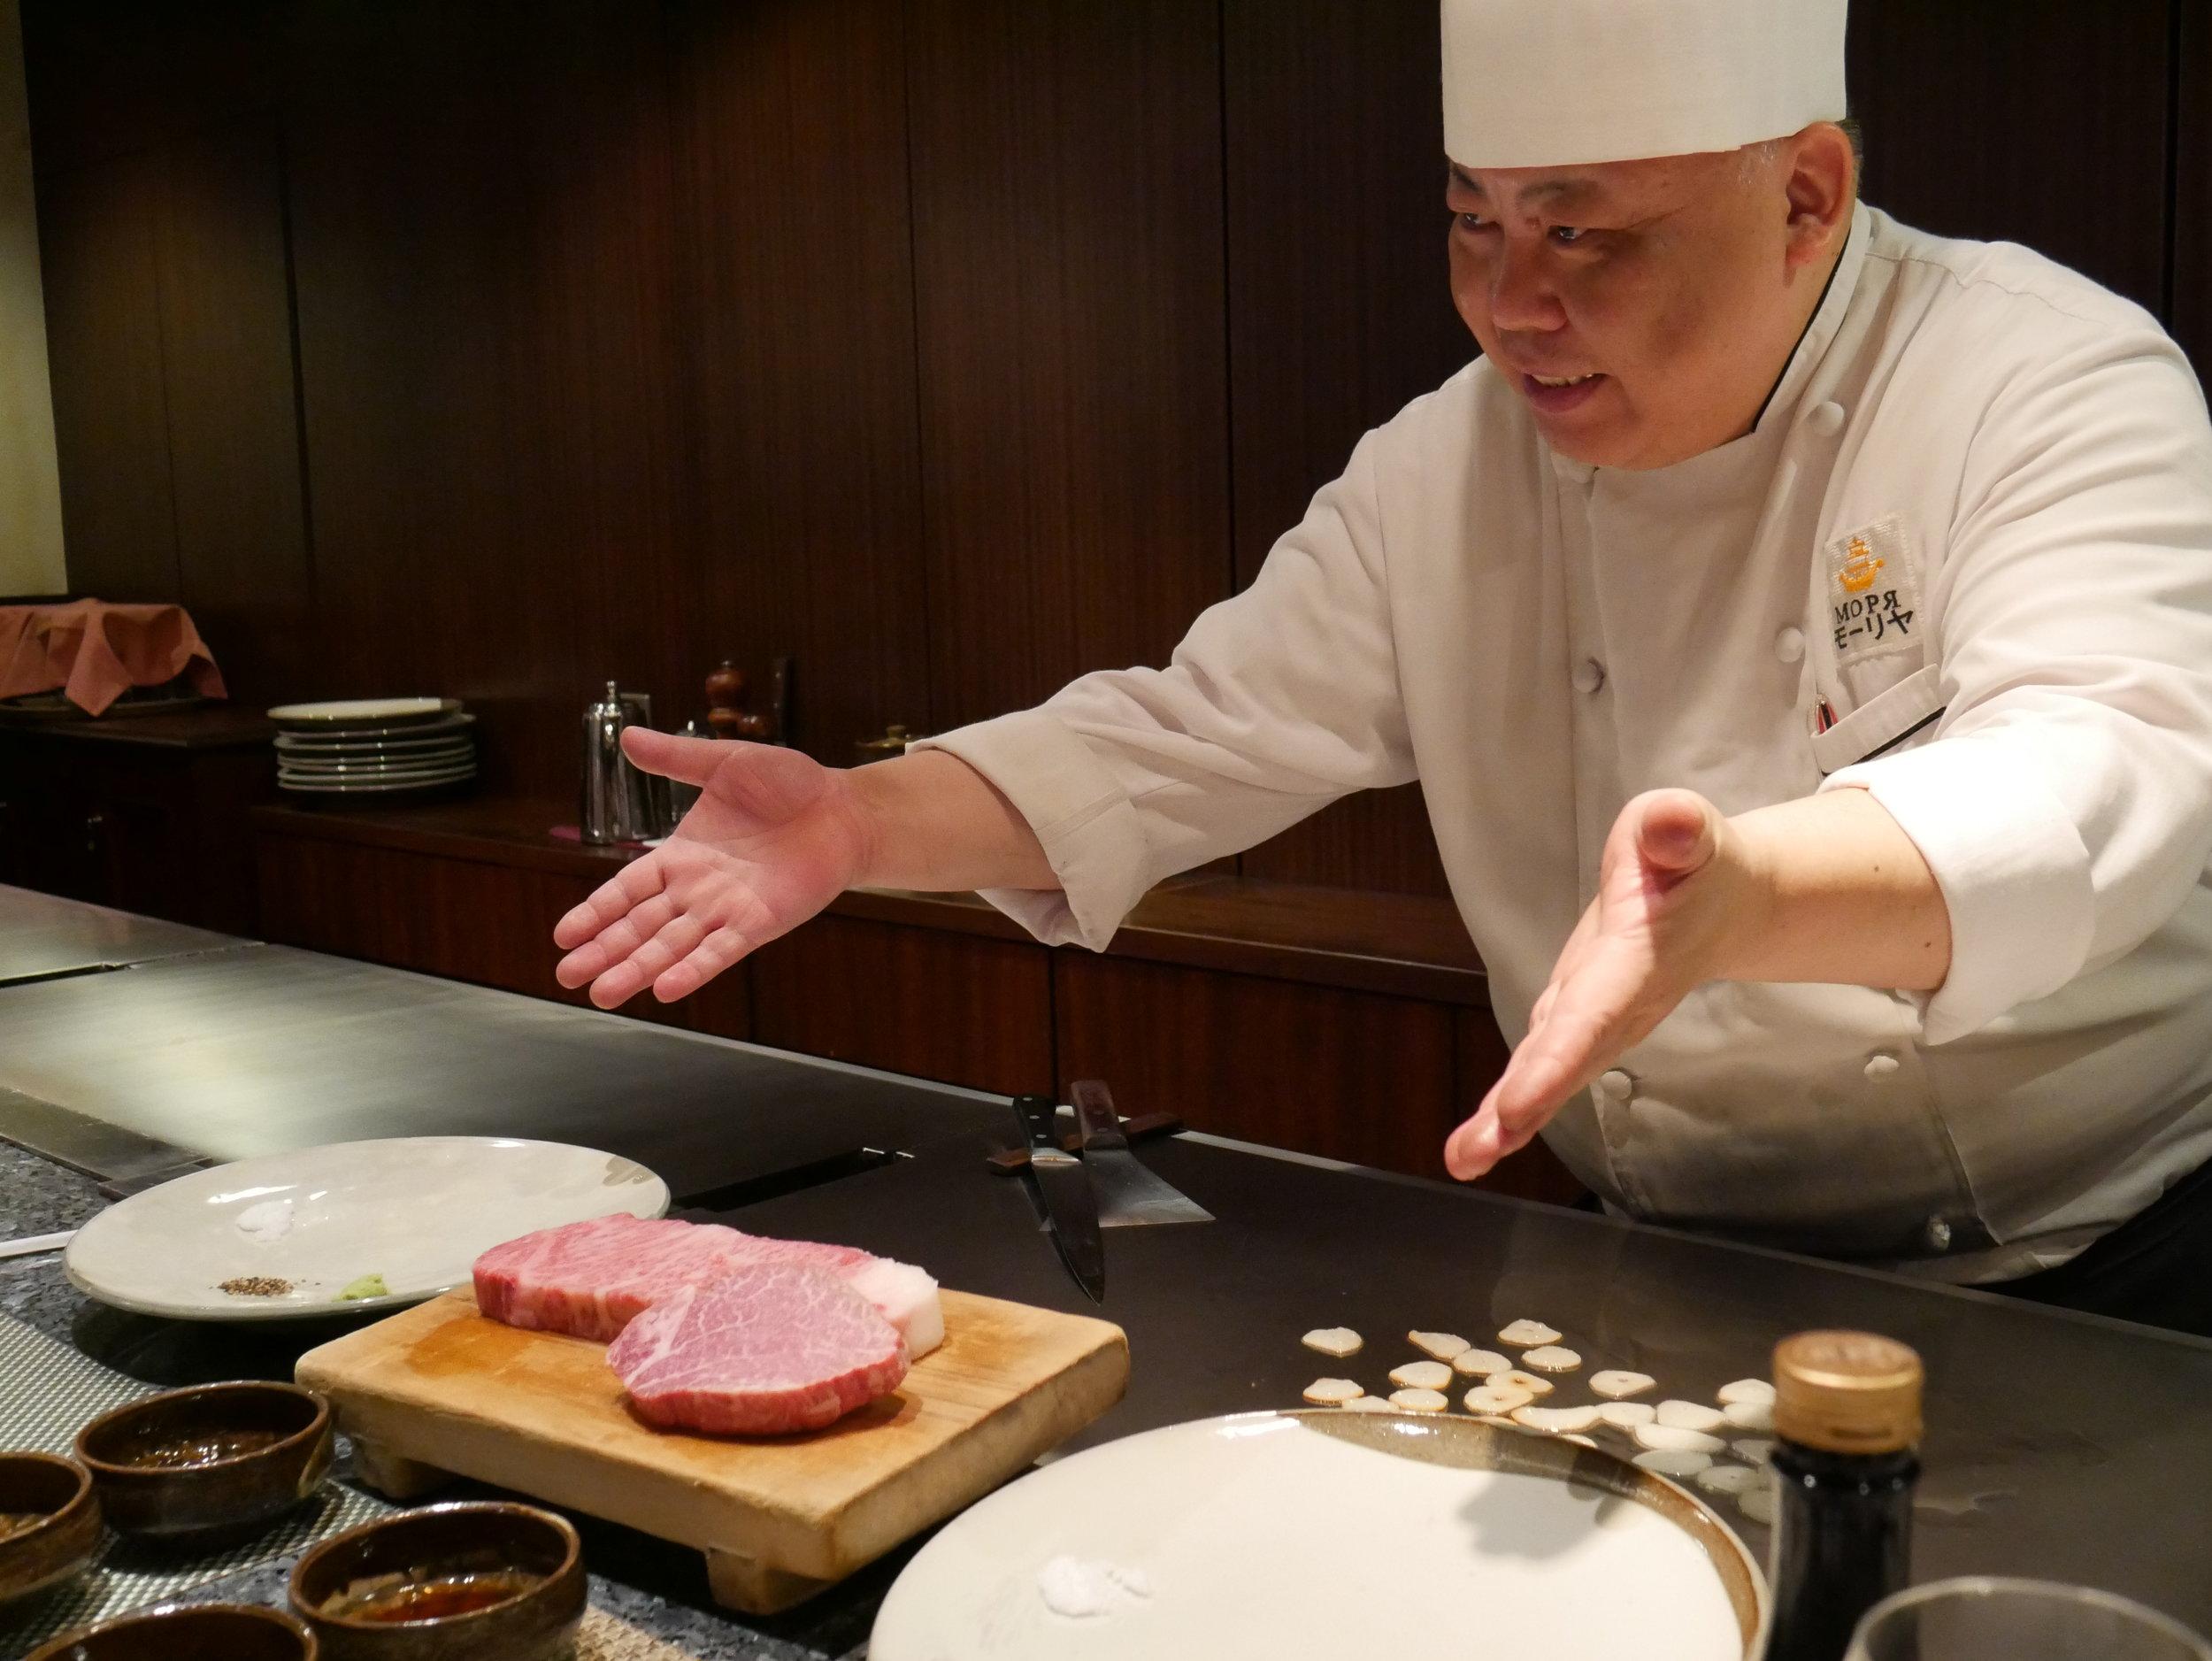 Cooking / Patissier